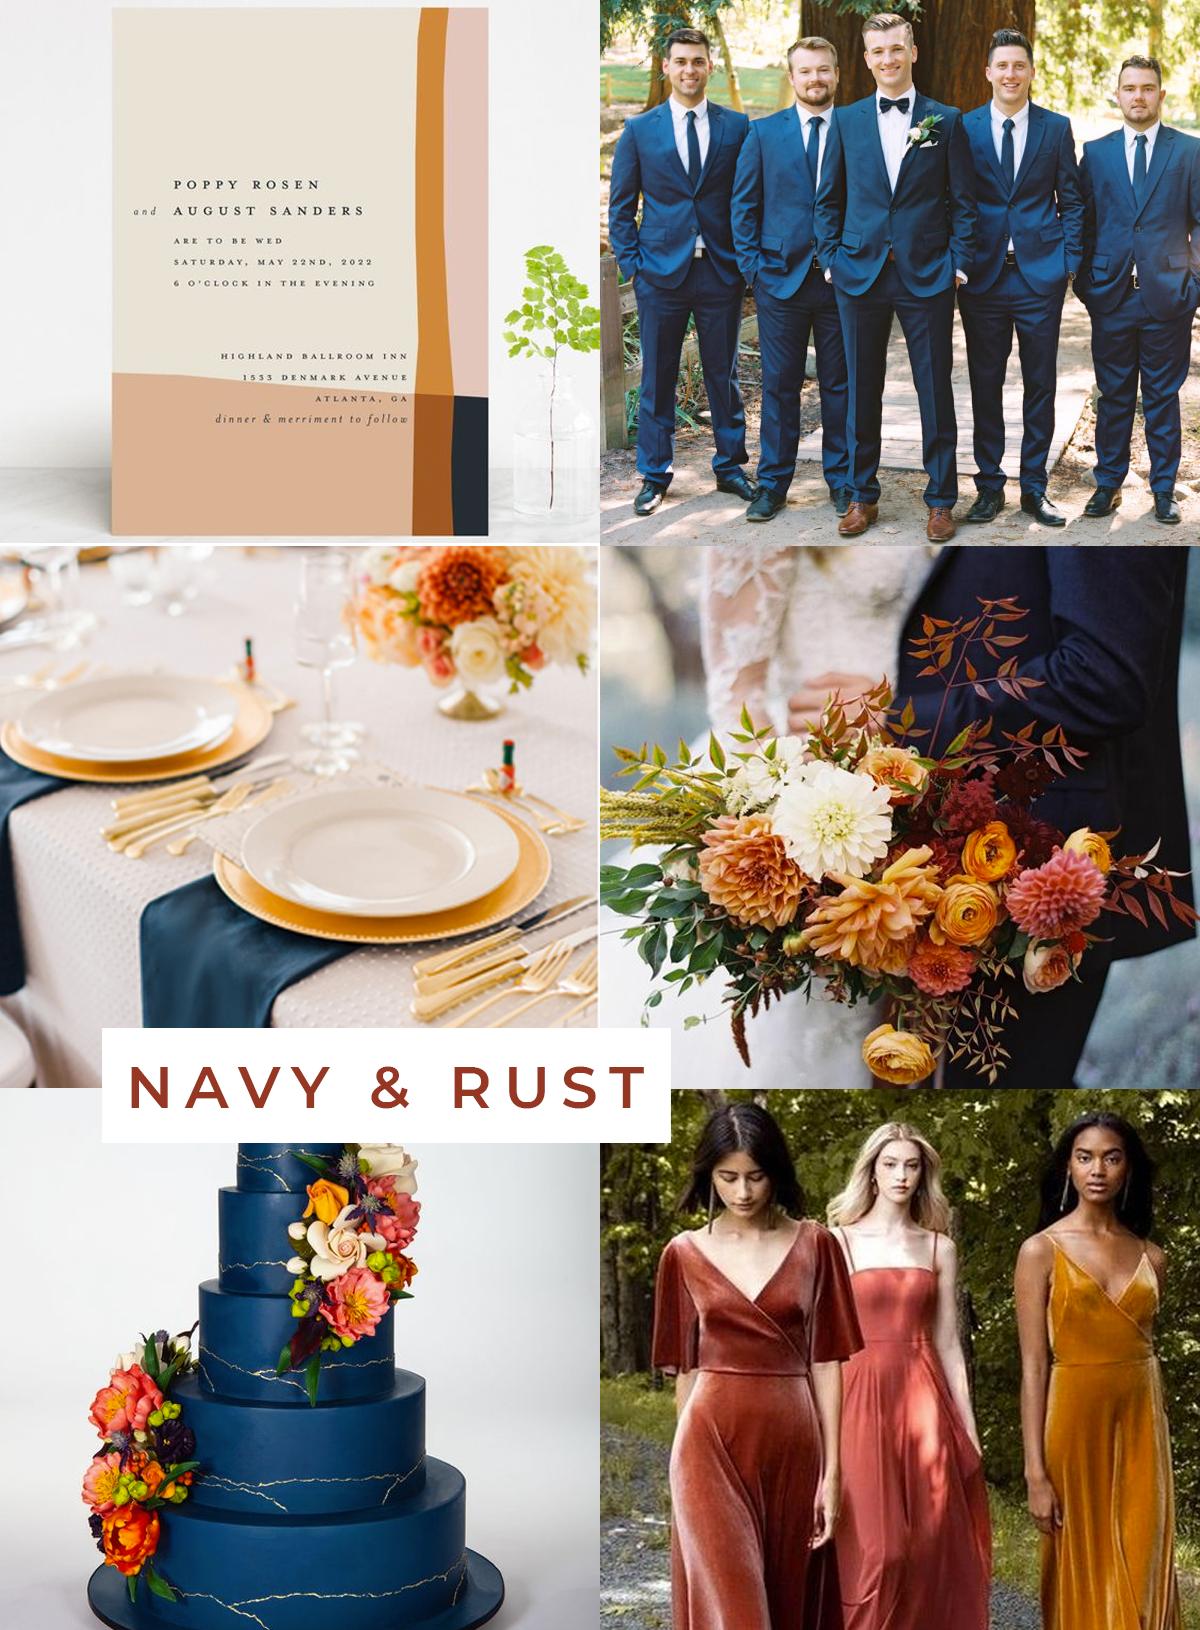 Navy and Rust Wedding theme inspiration from West-South #fallwedding #navywedding #weddingideas #weddingplanning